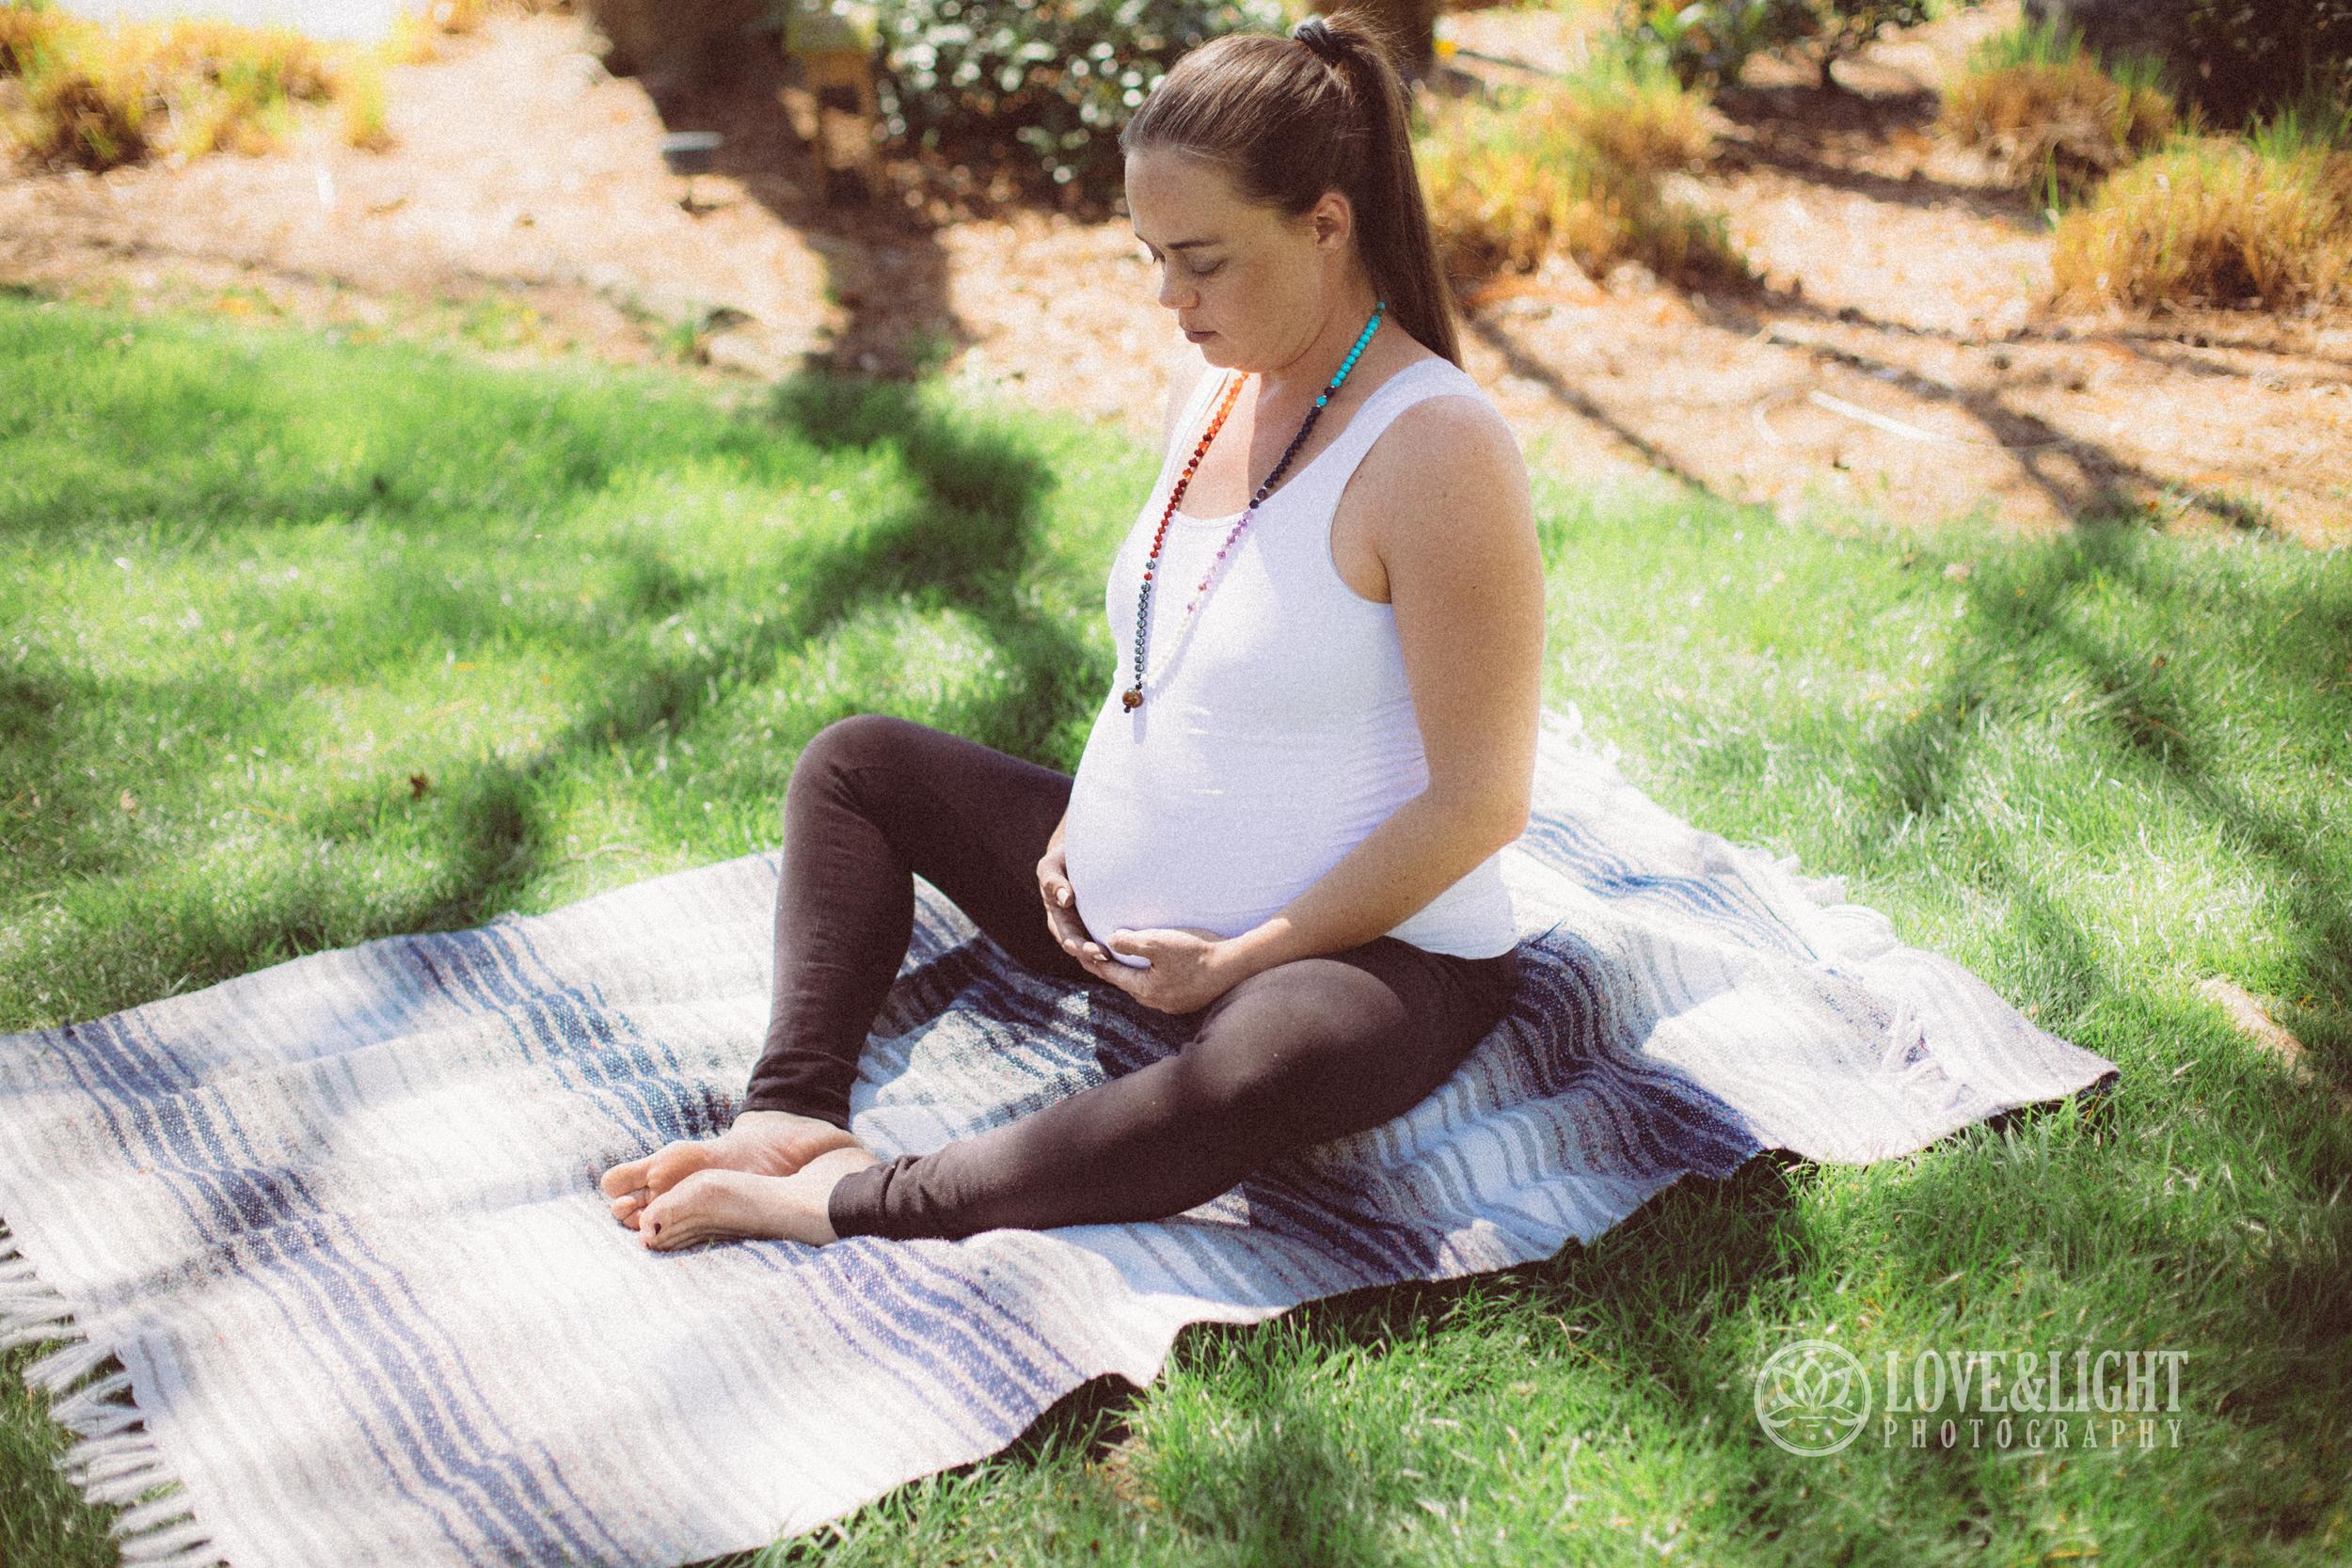 Newborn photographer, maternity photographer, prenatal yoga, lake norman, love and light photography